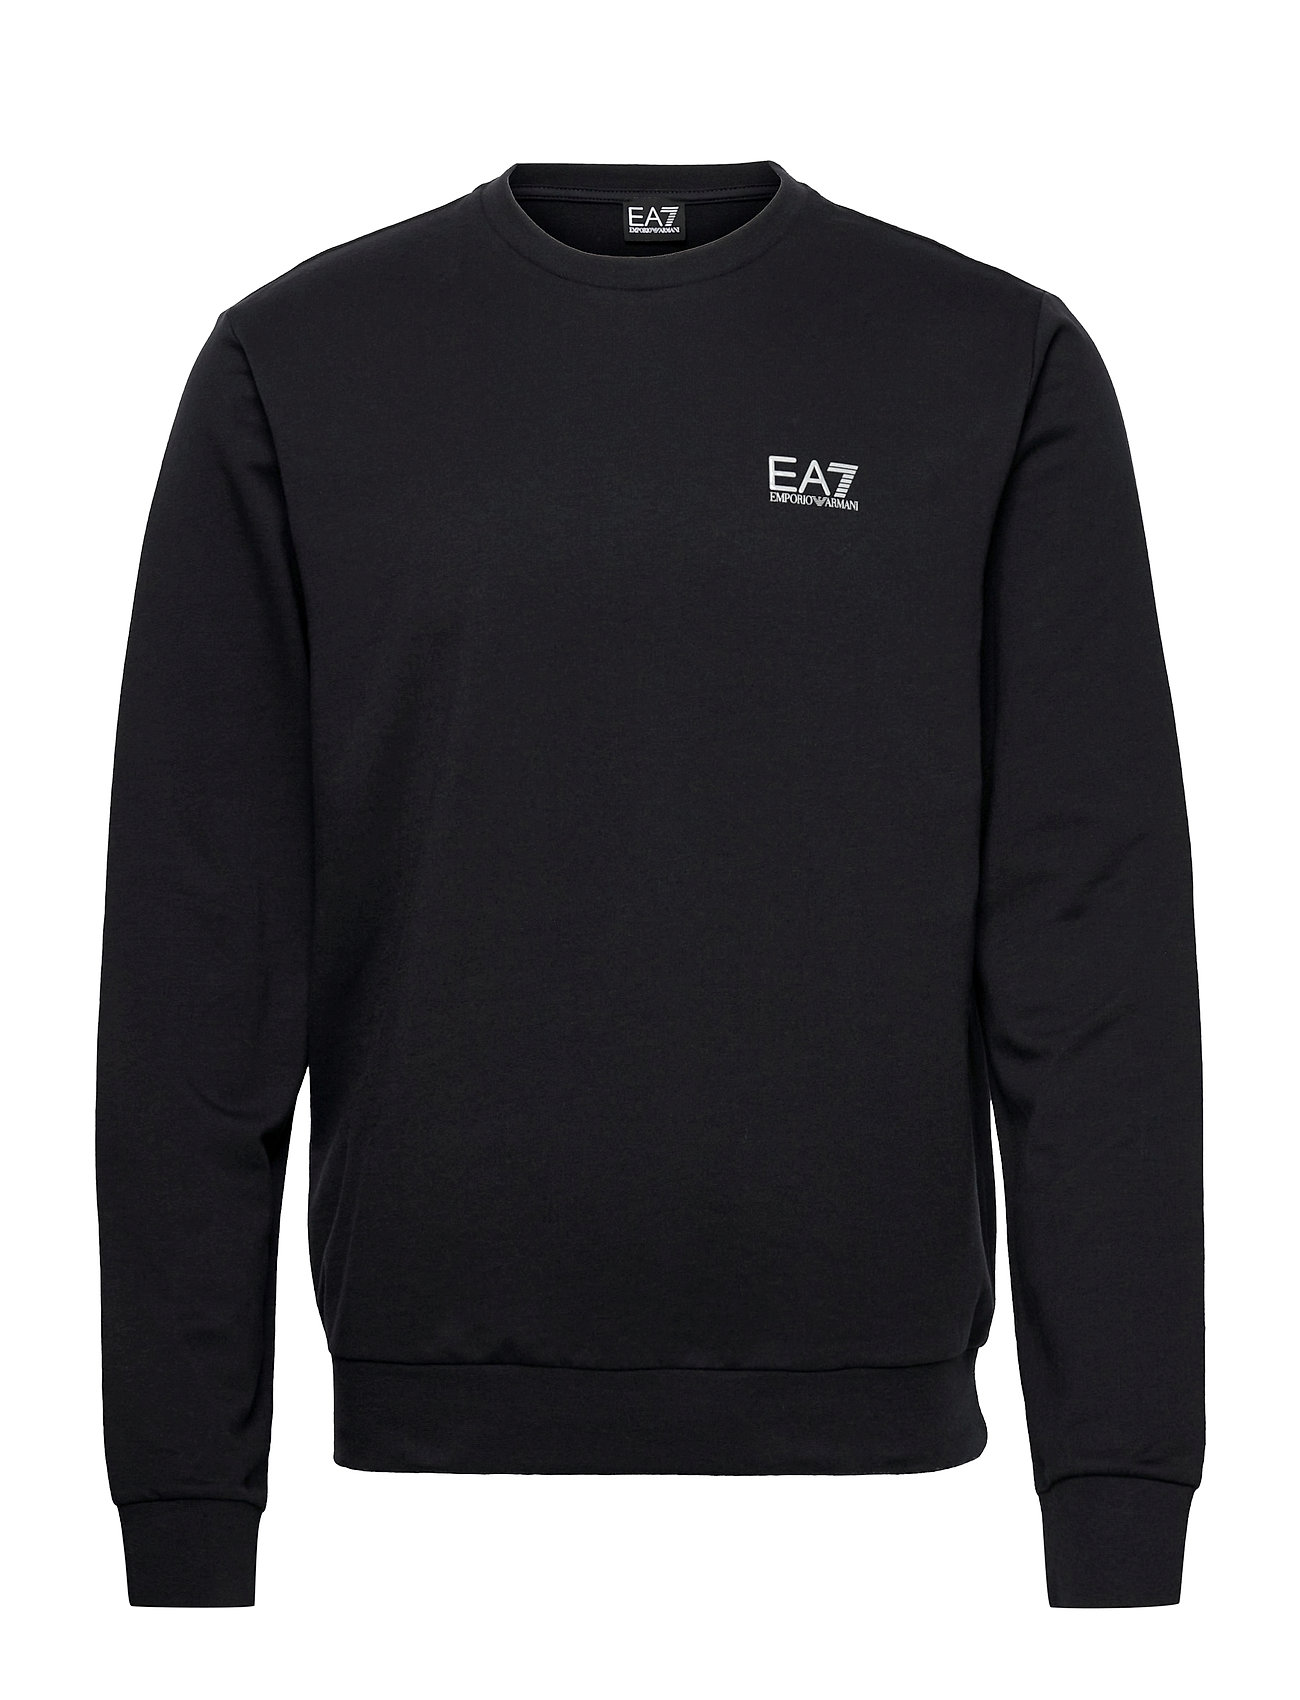 Sweatshirt Sweatshirt Trøje Sort EA7